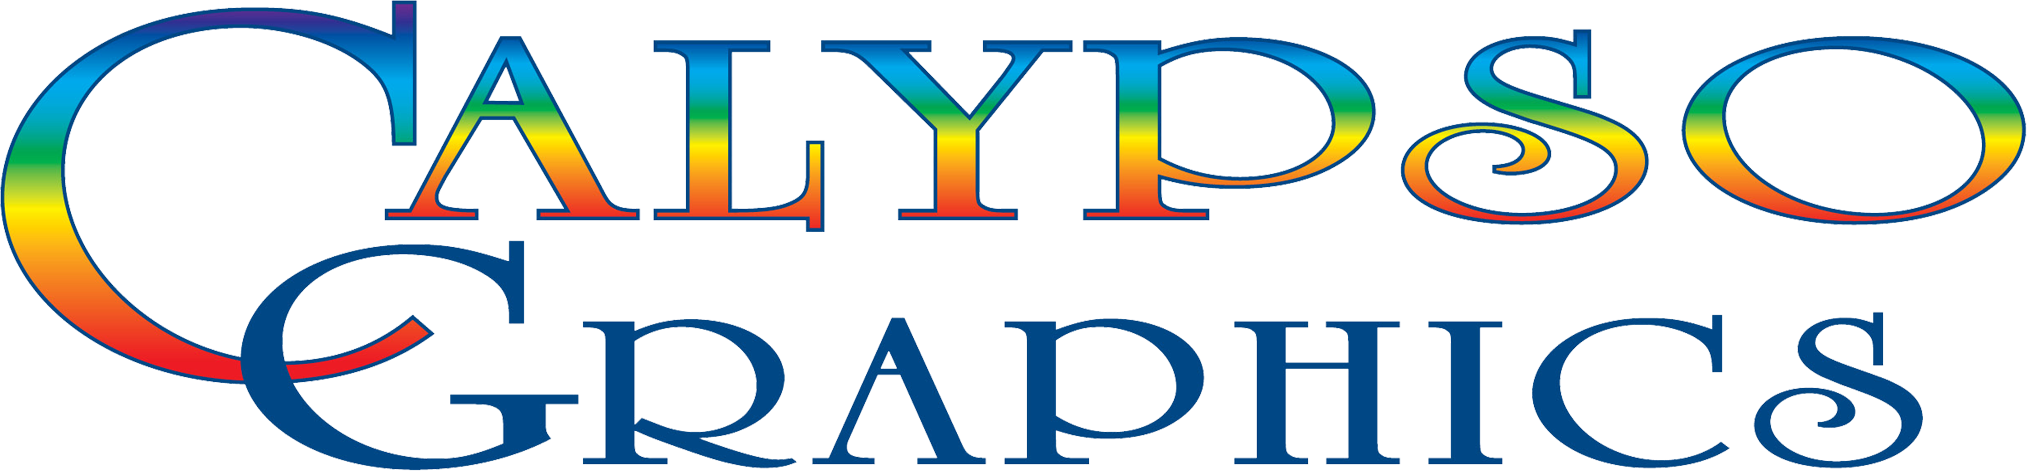 Calypso Graphics